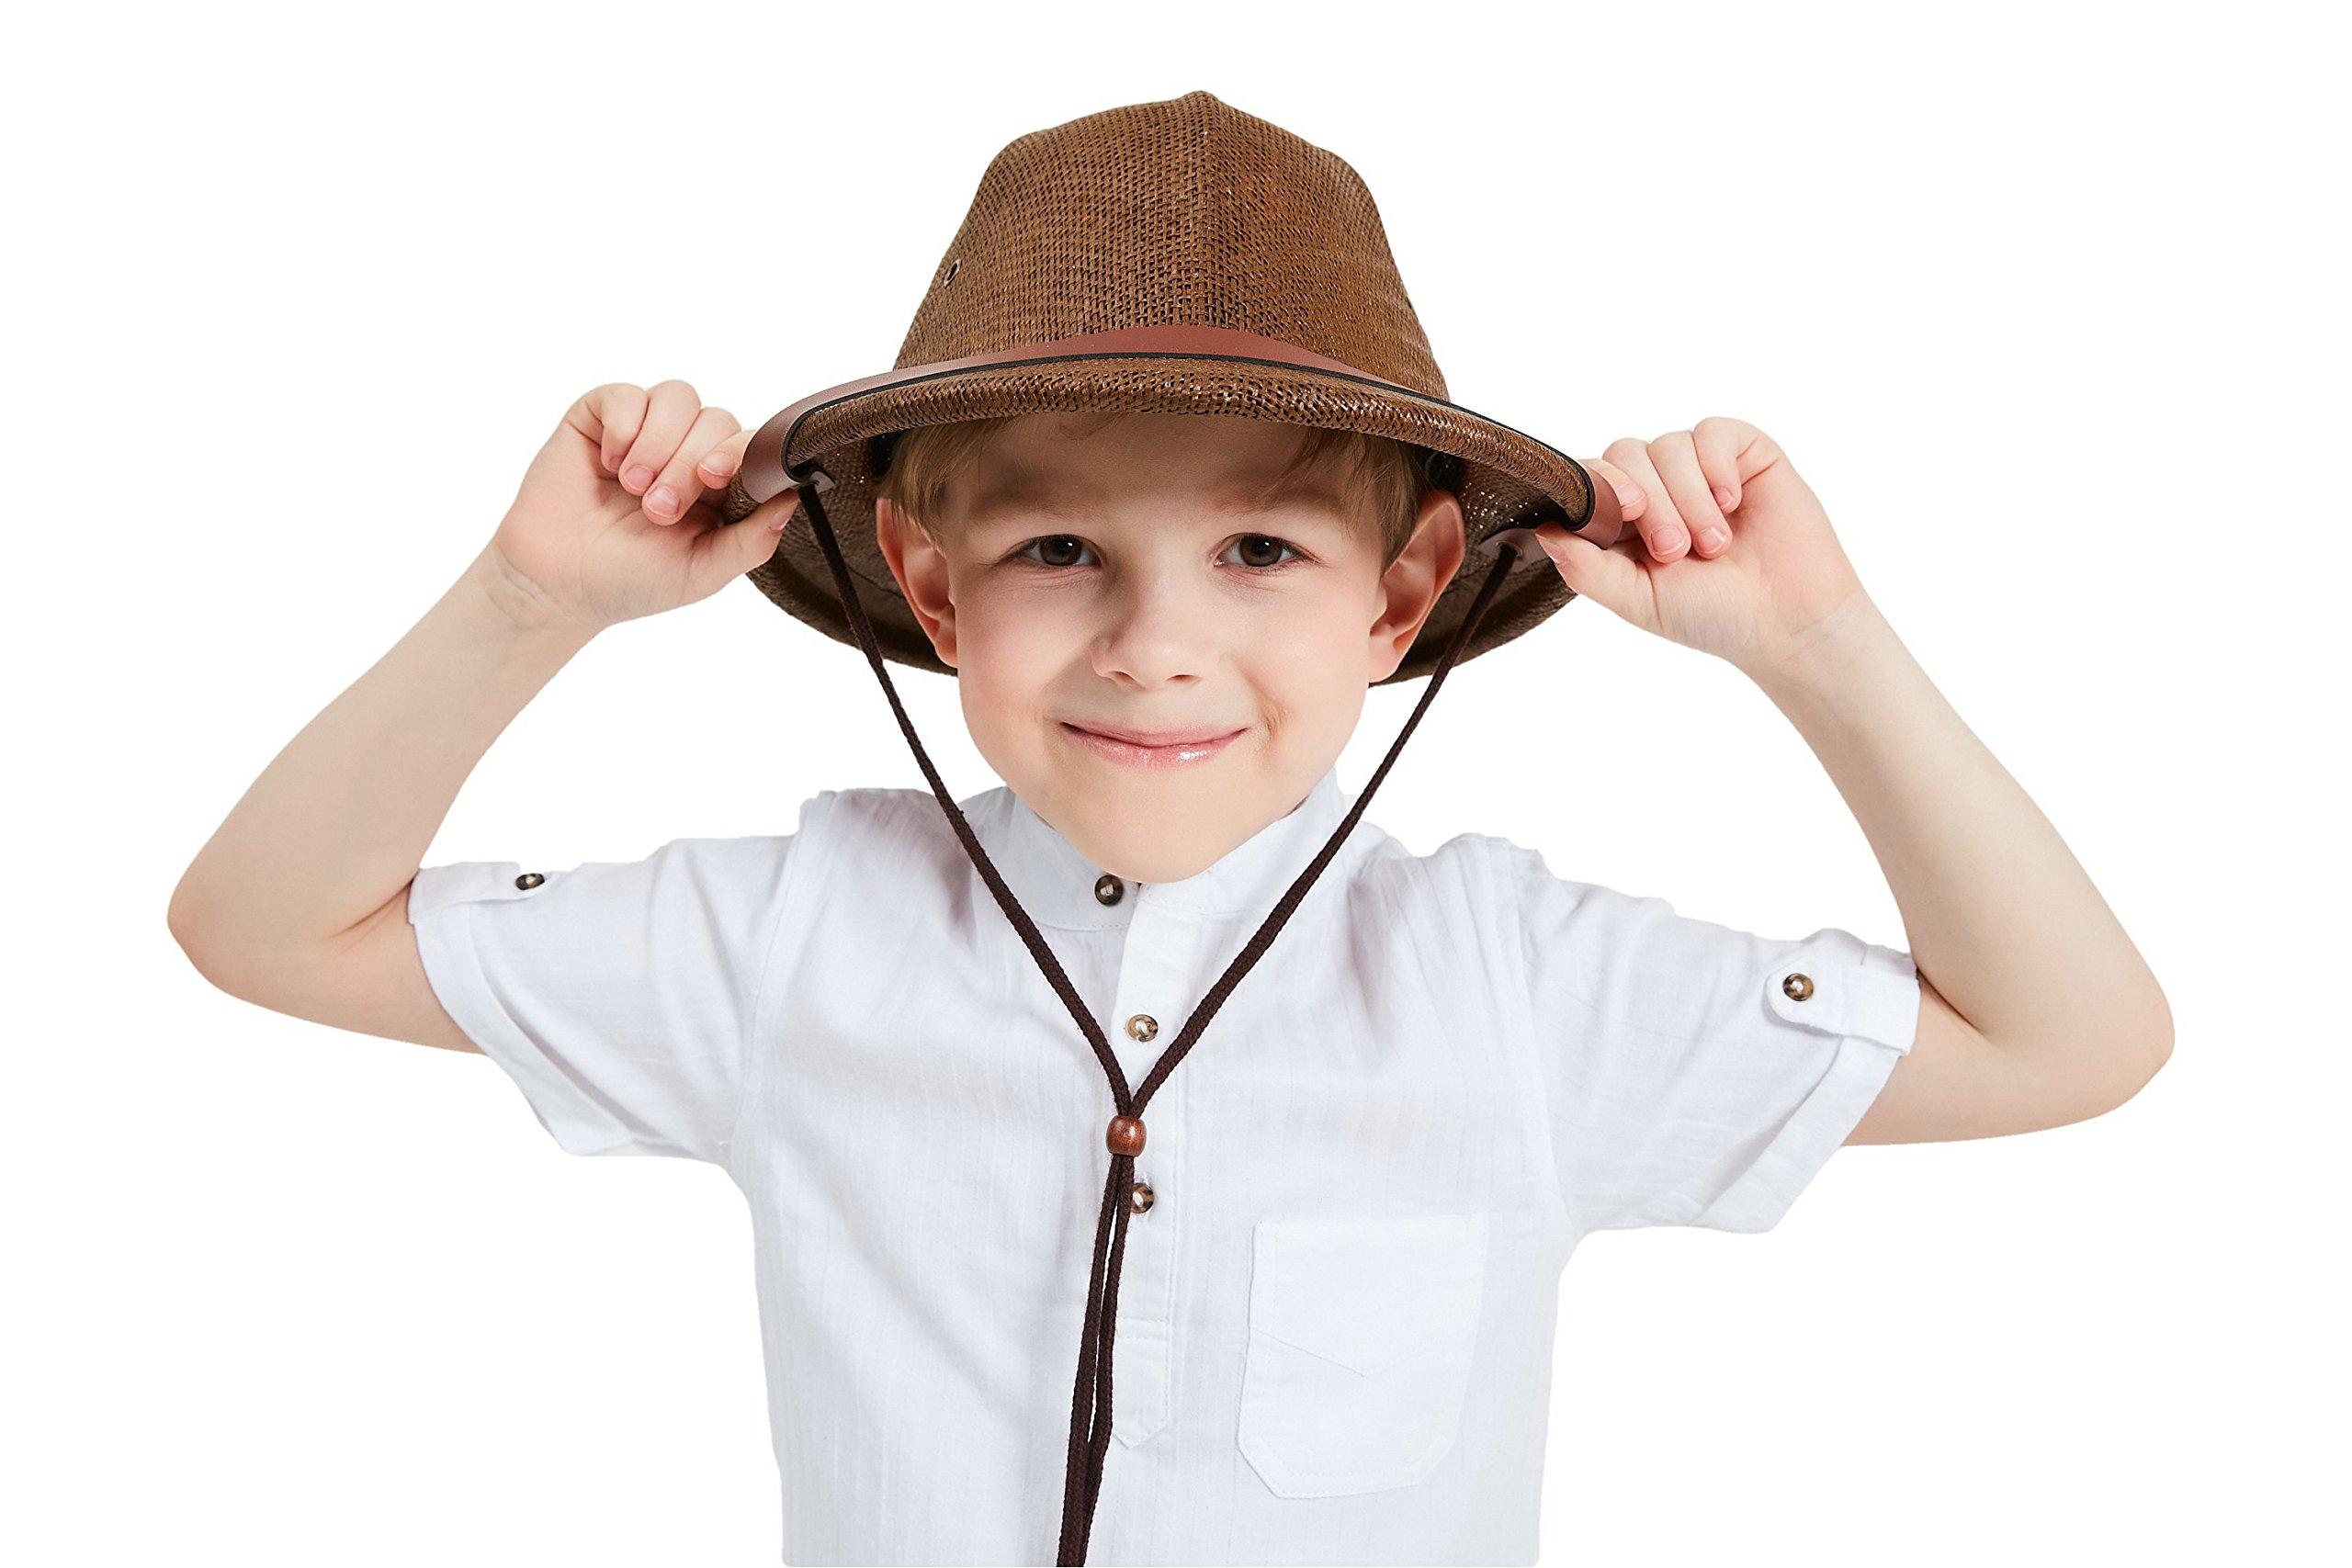 kainozoic Helmet Kids Safari Costume Party Hat Biking Hiking Camping Jungle Explorer Cap Chocolate Brown Gift for Boy